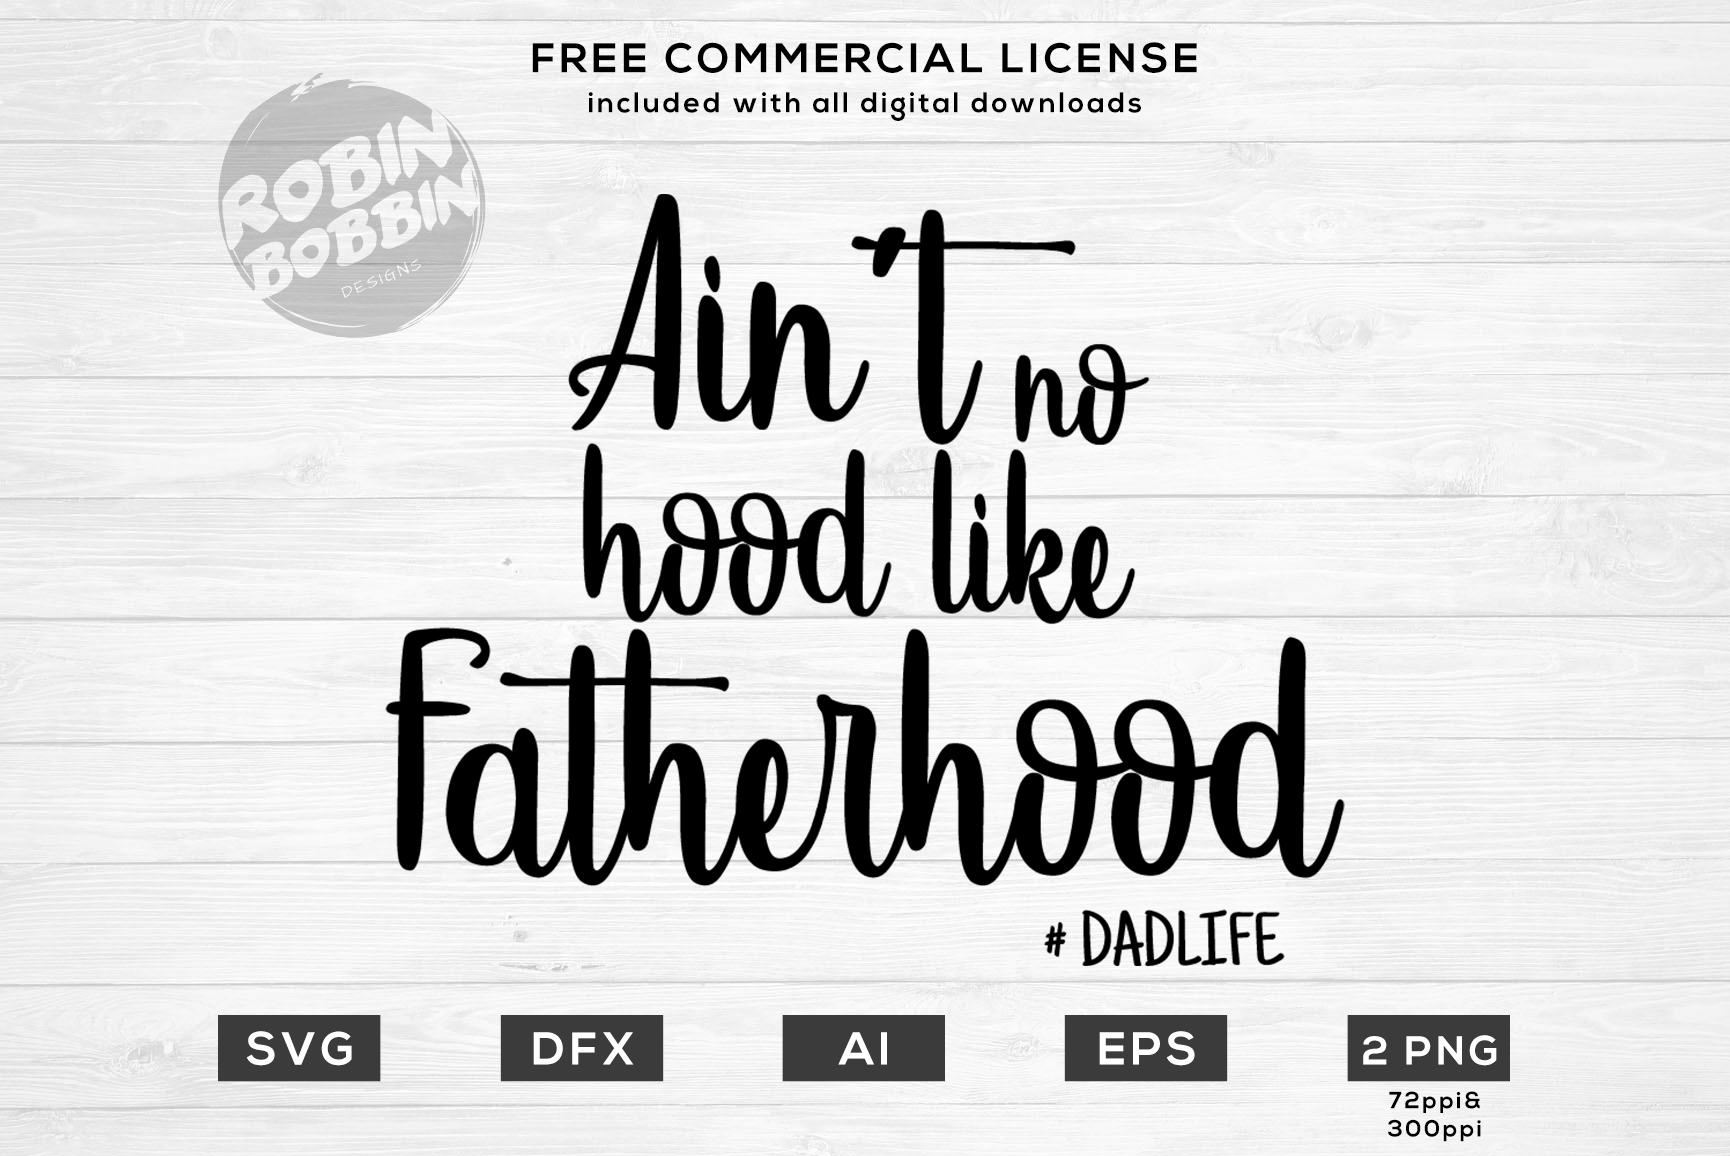 Ain't no Hood, like Fatherhood Design for T-Shirt, Hoodies example image 1